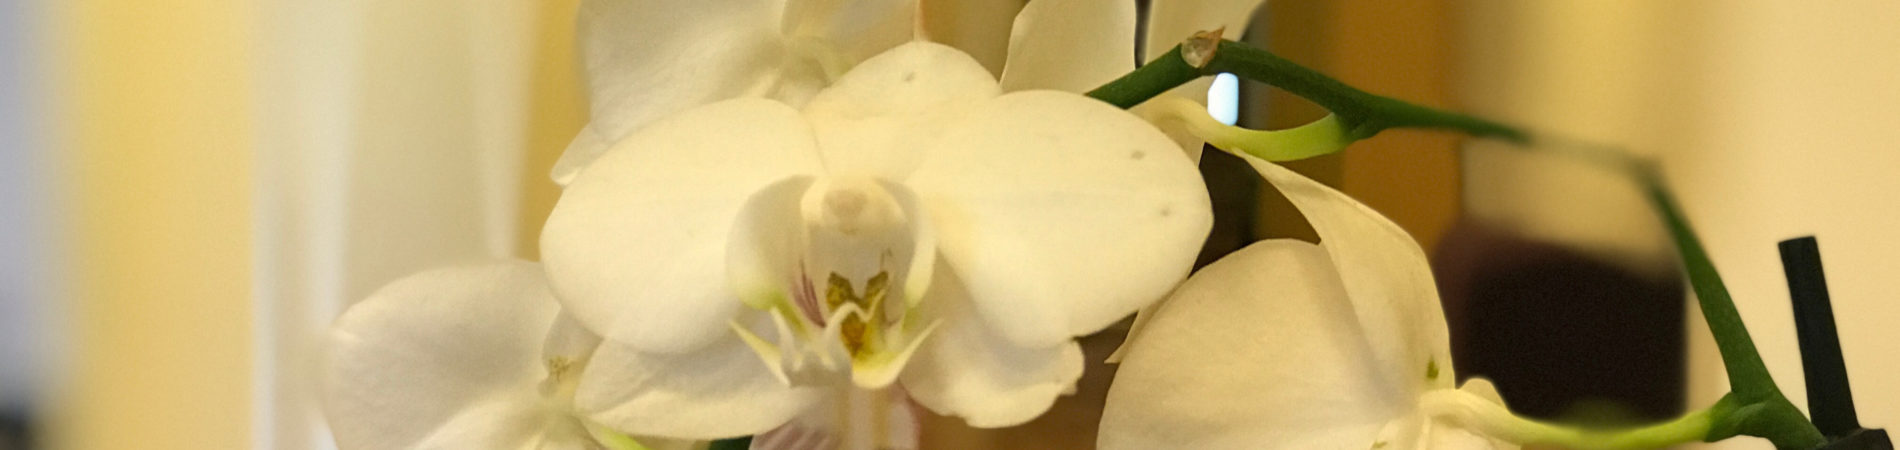 Blomma2